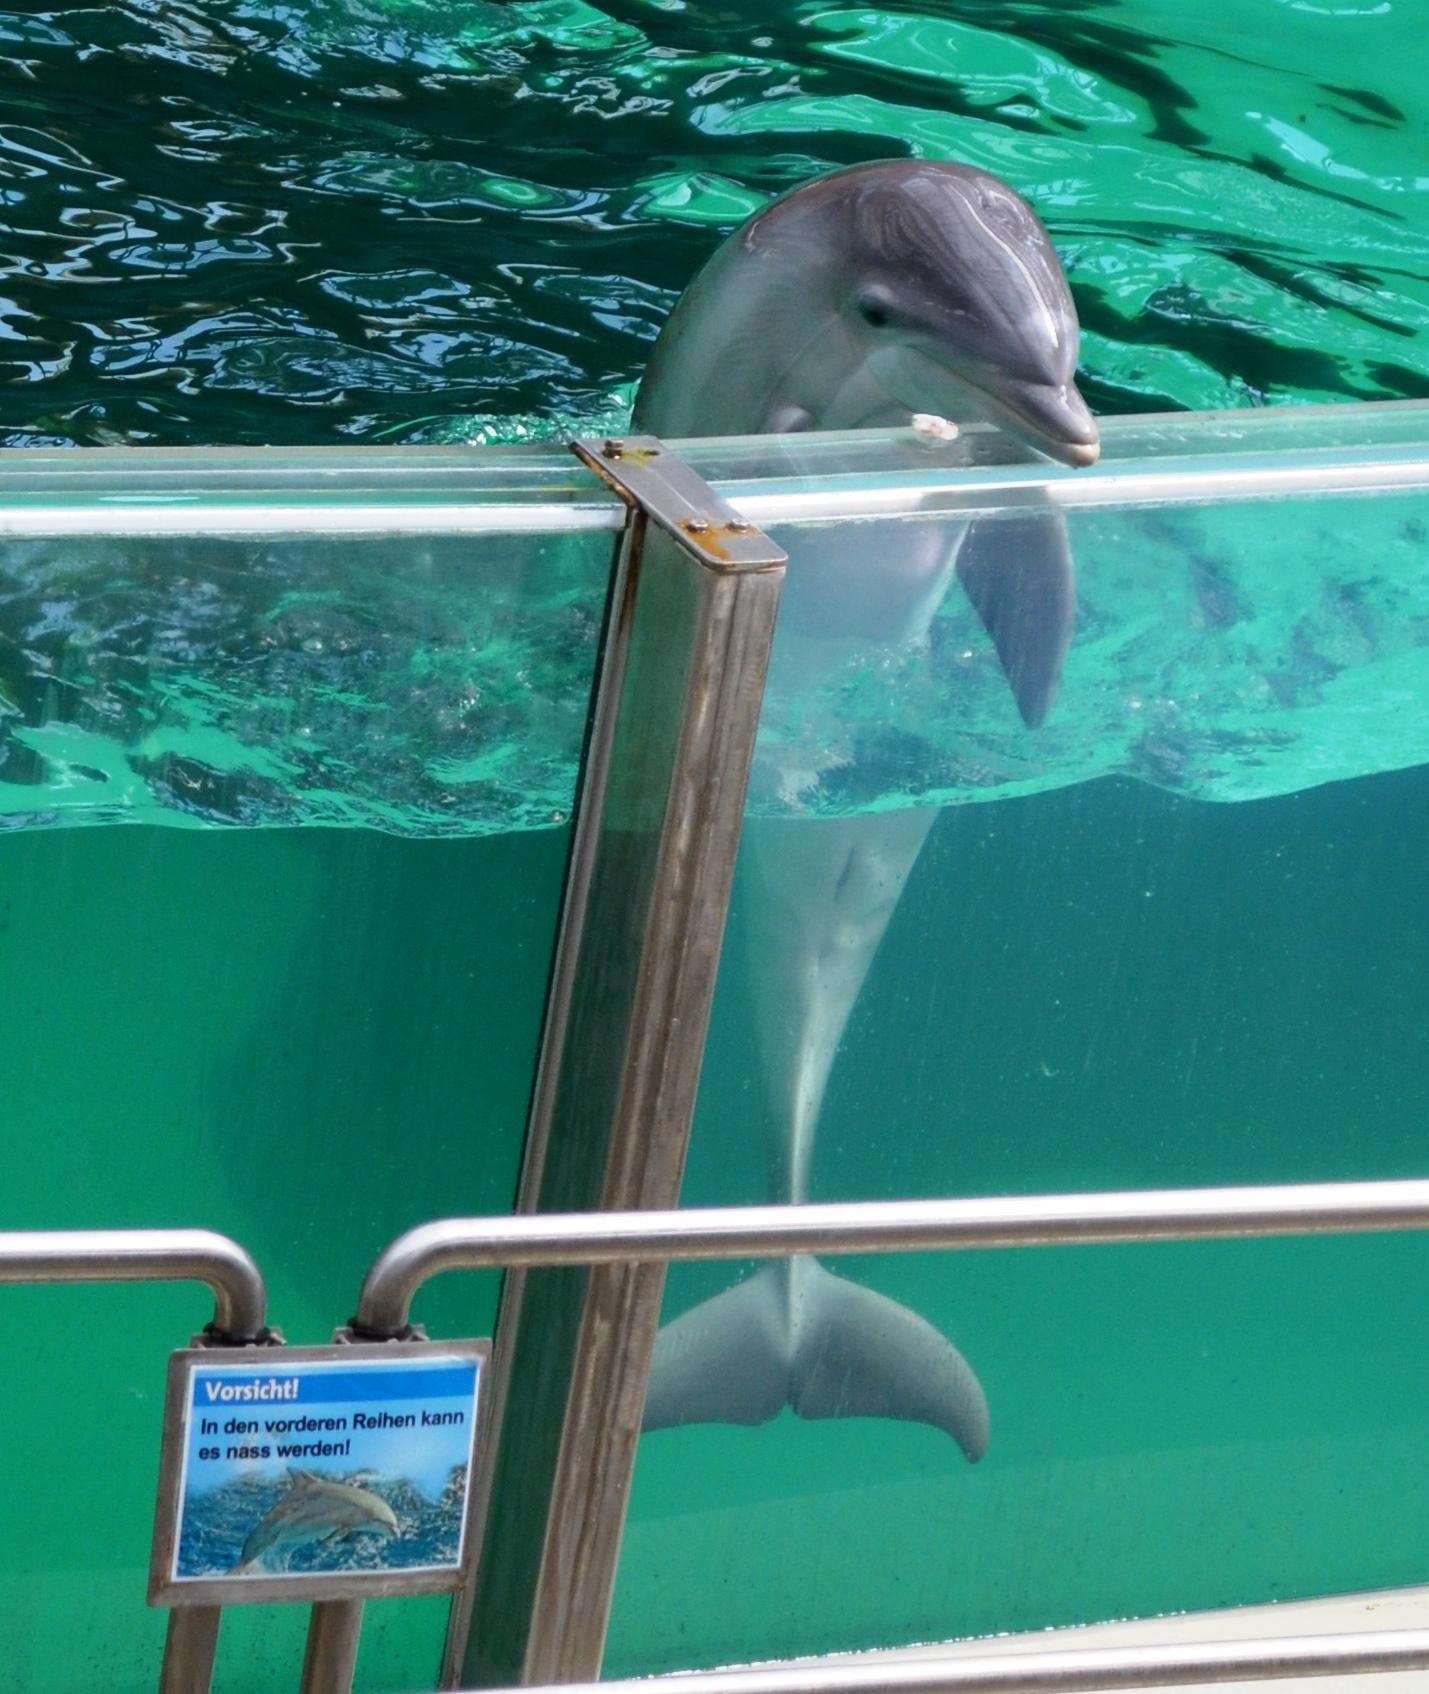 Captive bottlenose dolphin at Duisburg Zoo